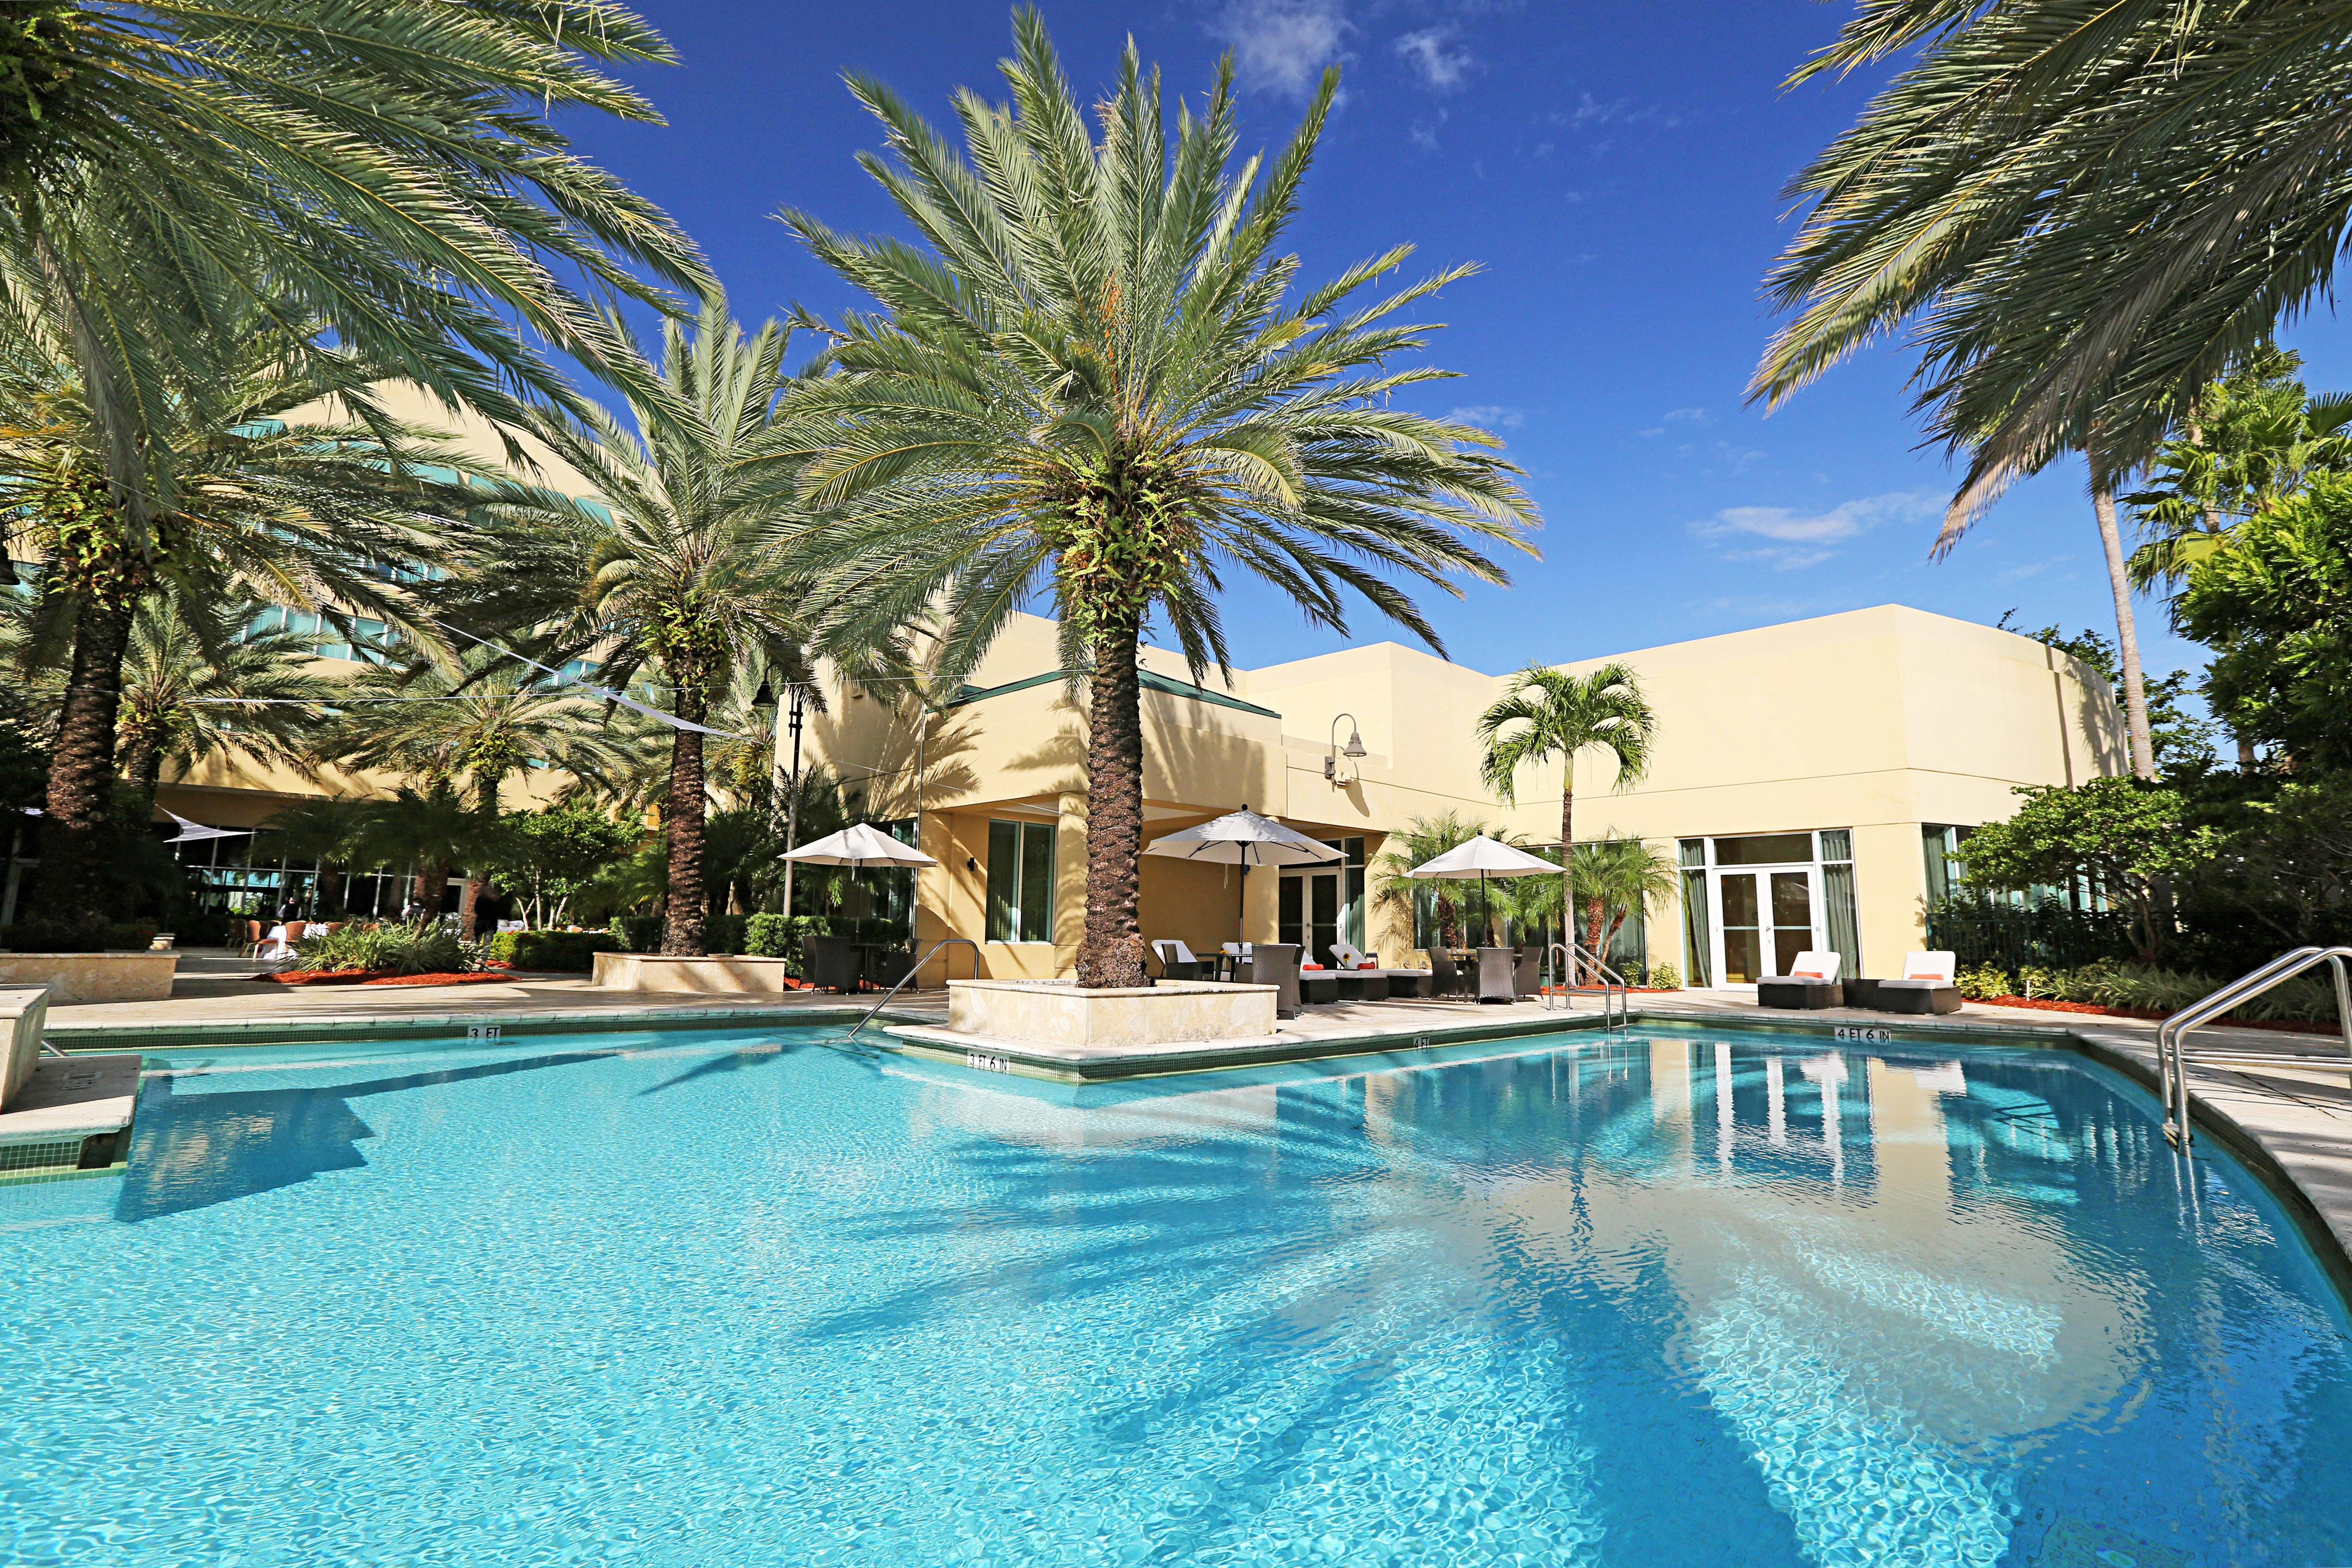 Play Pool Resort tree palm swimming pool property blue Villa swimming condominium resort town caribbean plant arecales reef lined